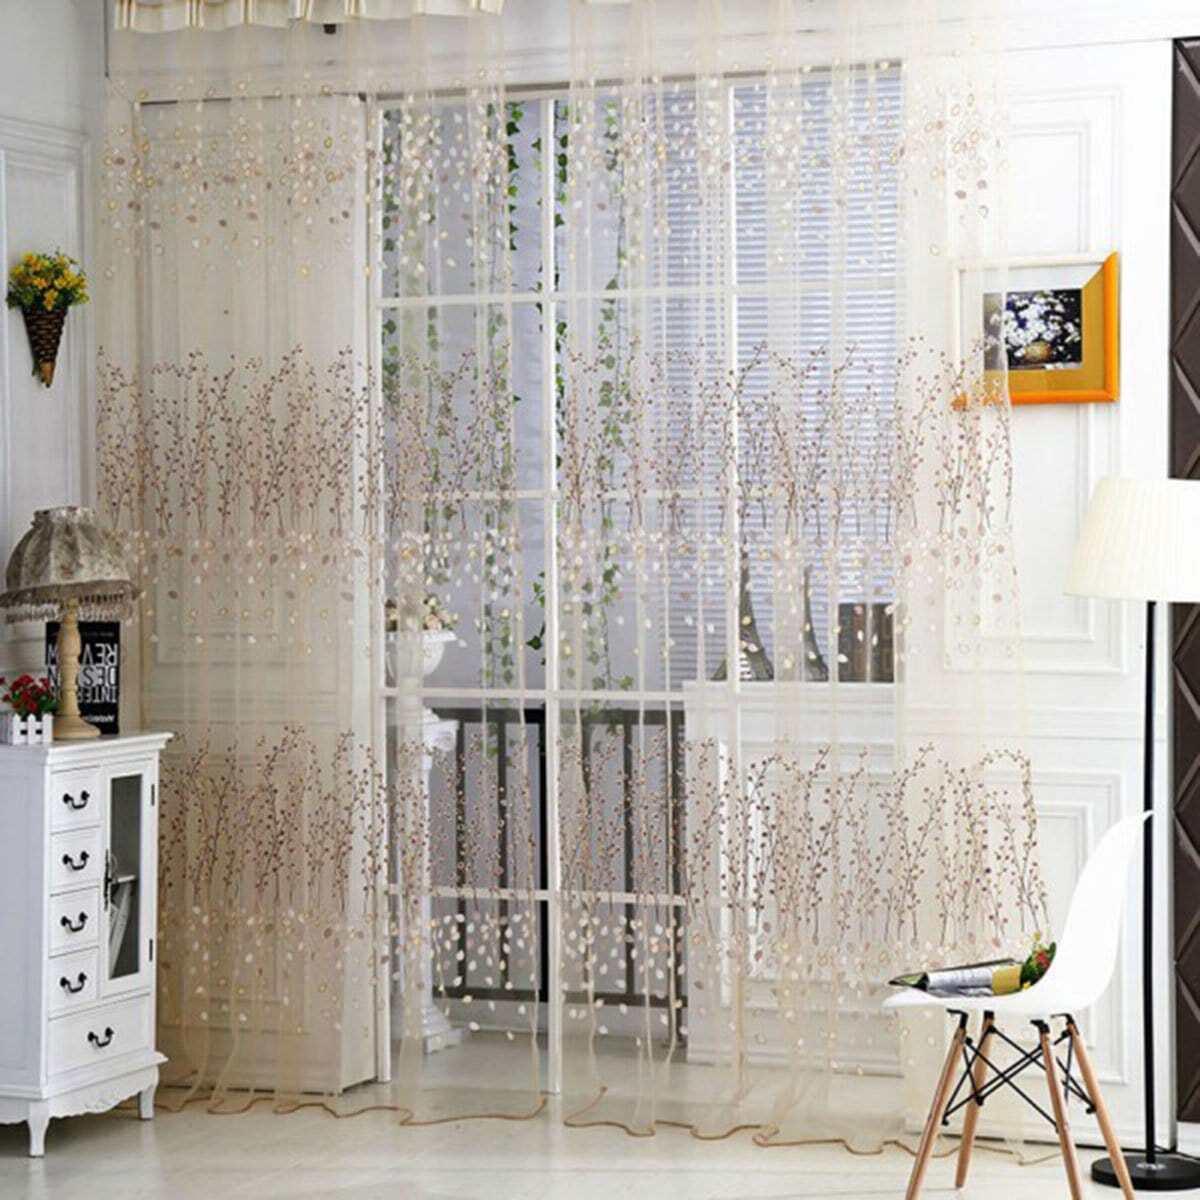 Calico Print Rod Pocket Sheer Curtain 1pc